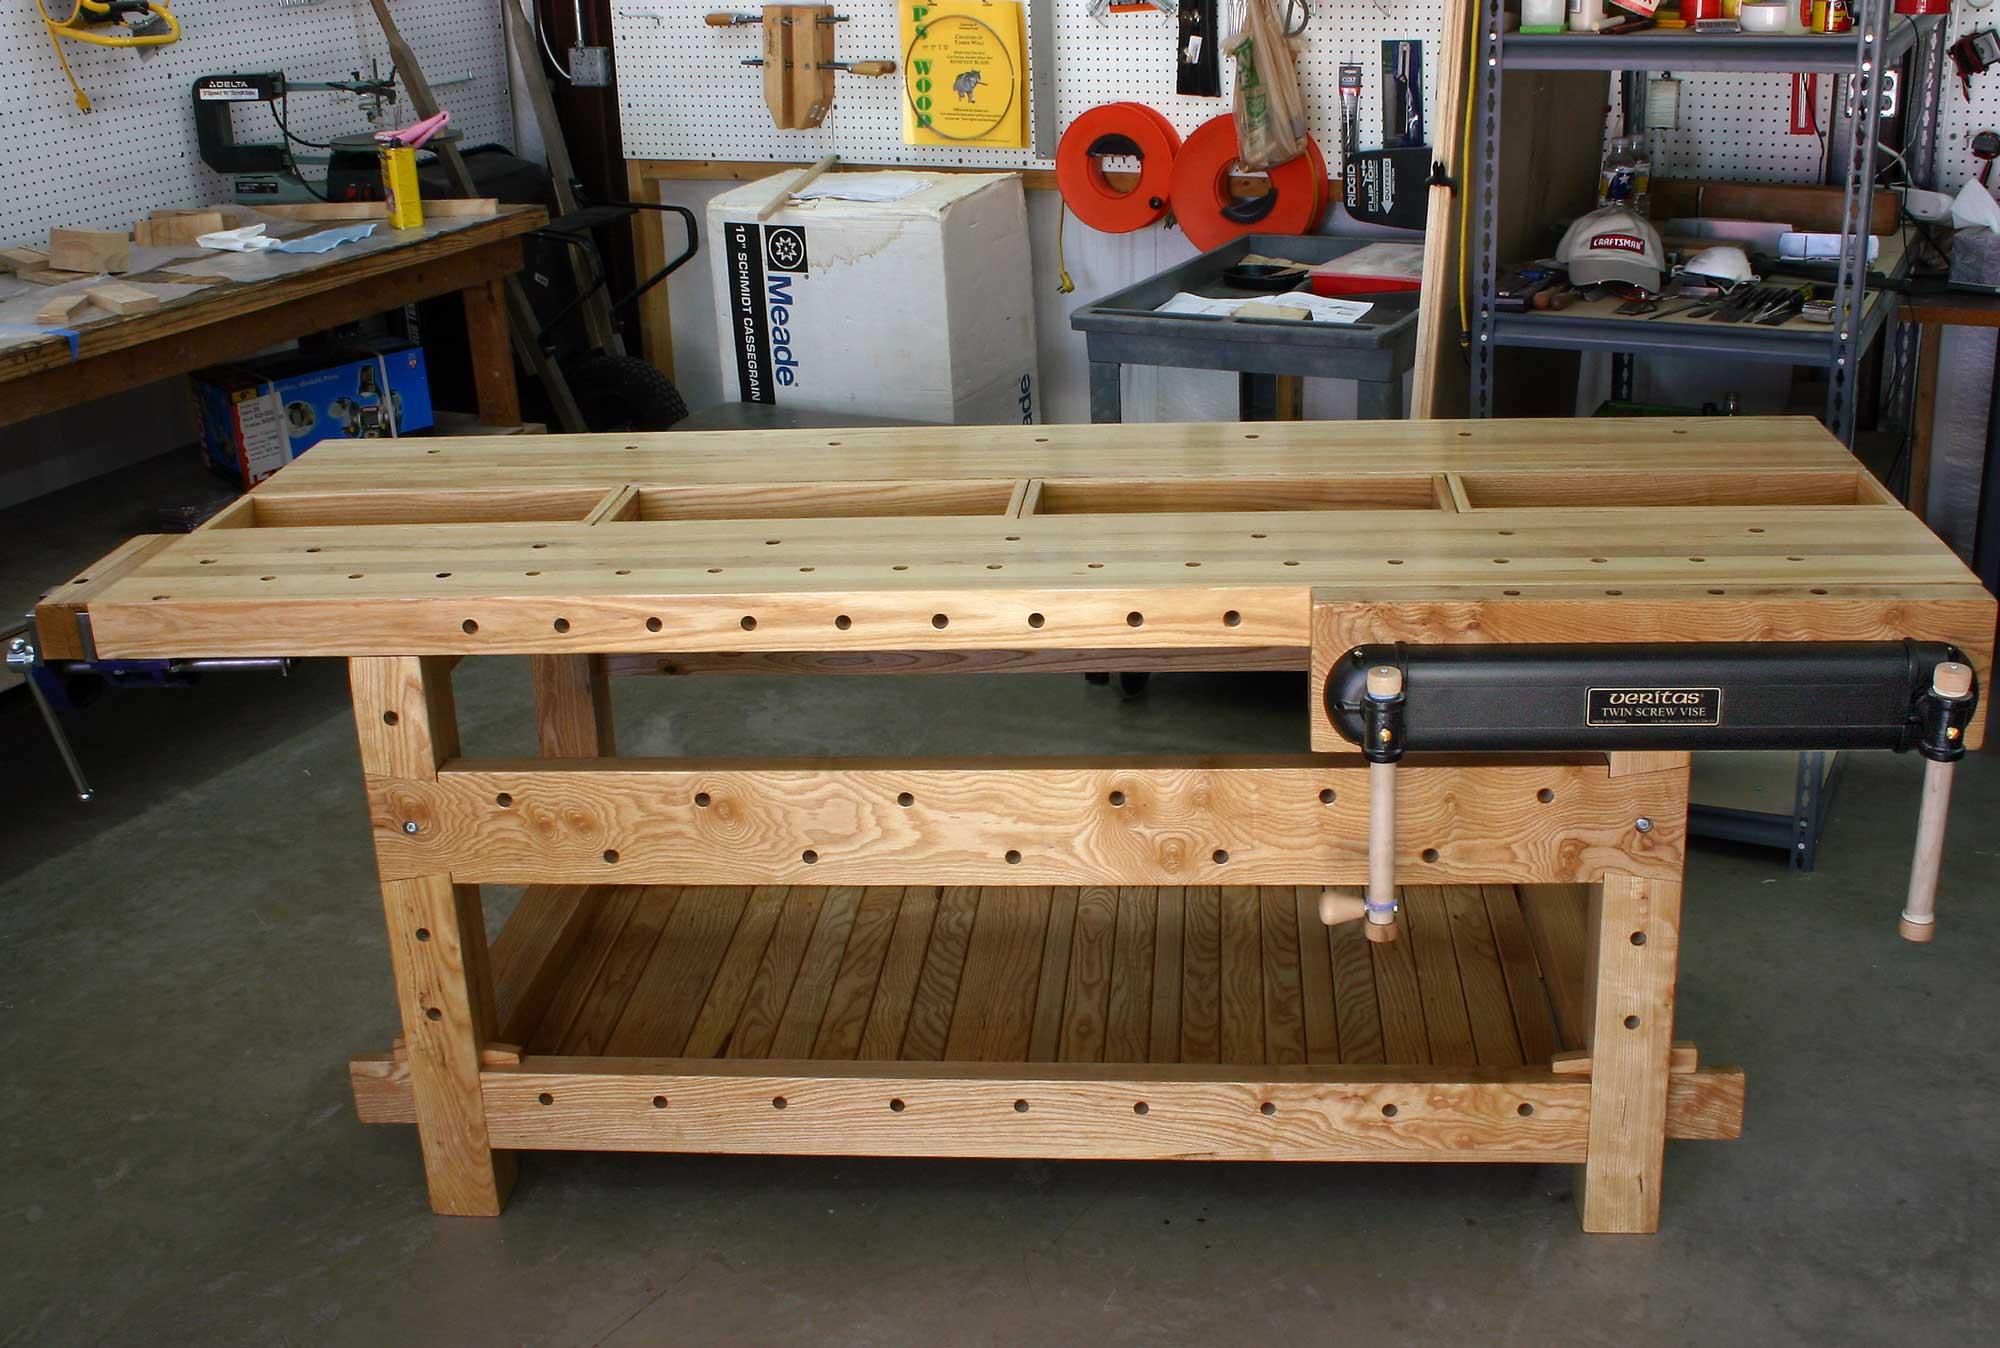 Buy Garage Workbench Plans Pdf Francois Career